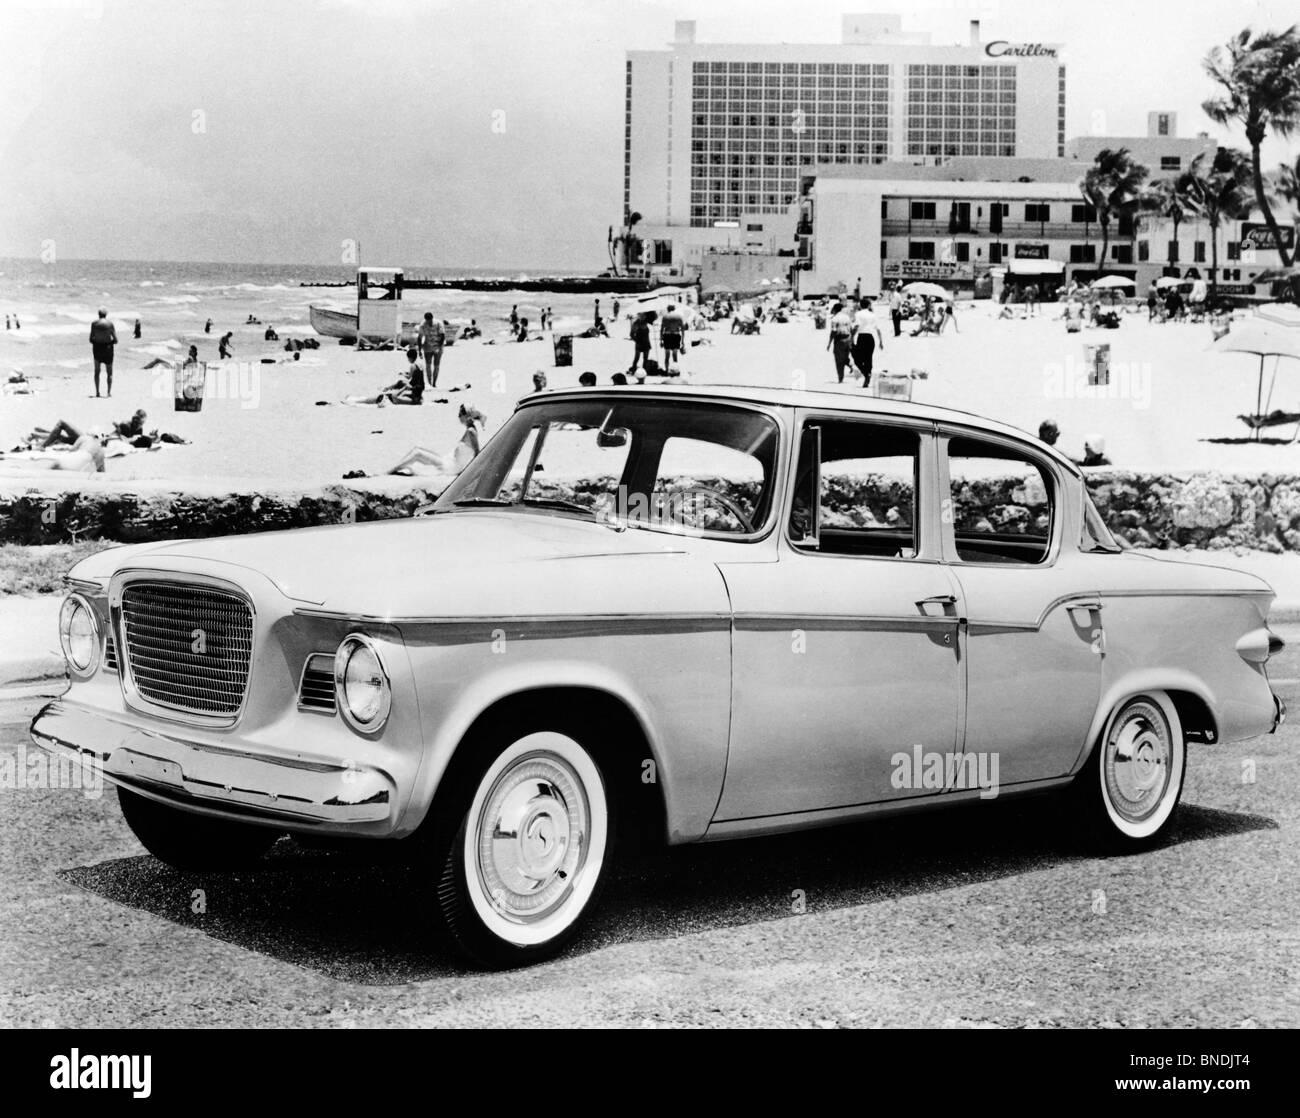 Vintage Car parked on street, Studebaker Lark, 1959 Photo Stock